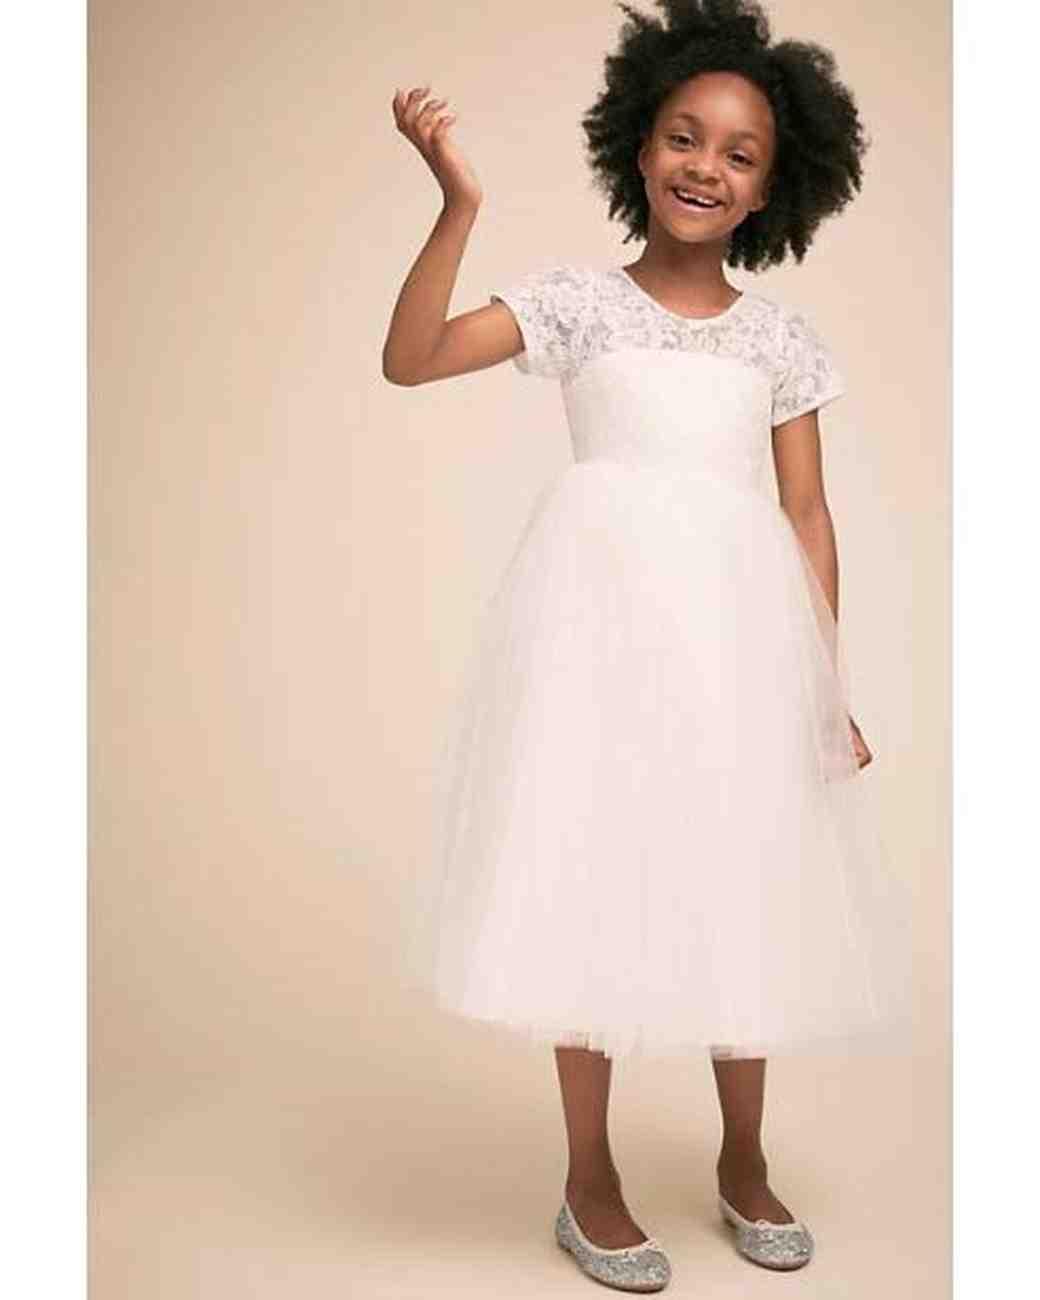 f4cd954aad71 The Most Adorable Flower Girl Dresses for a Winter Wedding | Martha Stewart  Weddings